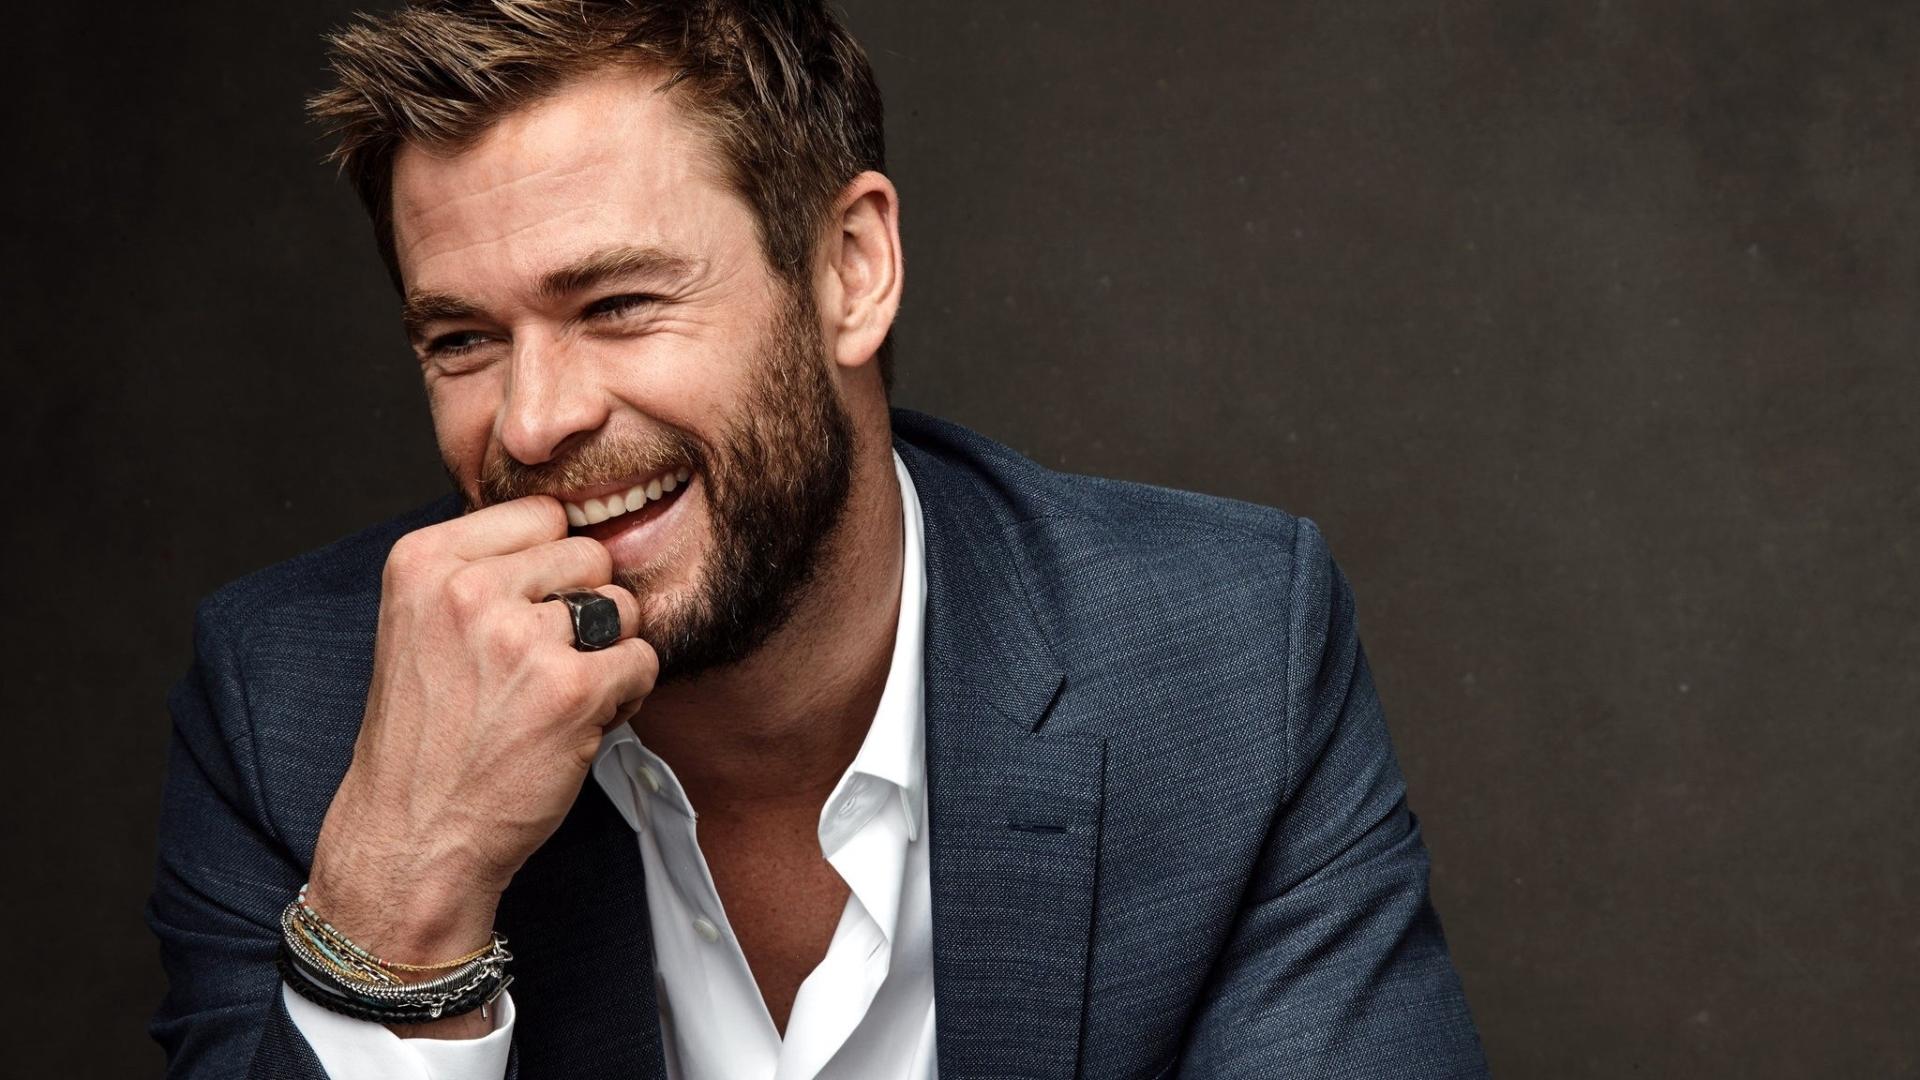 Chris Hemsworth images Chris Hemsworth Wallpaper HD wallpaper and 1920x1080